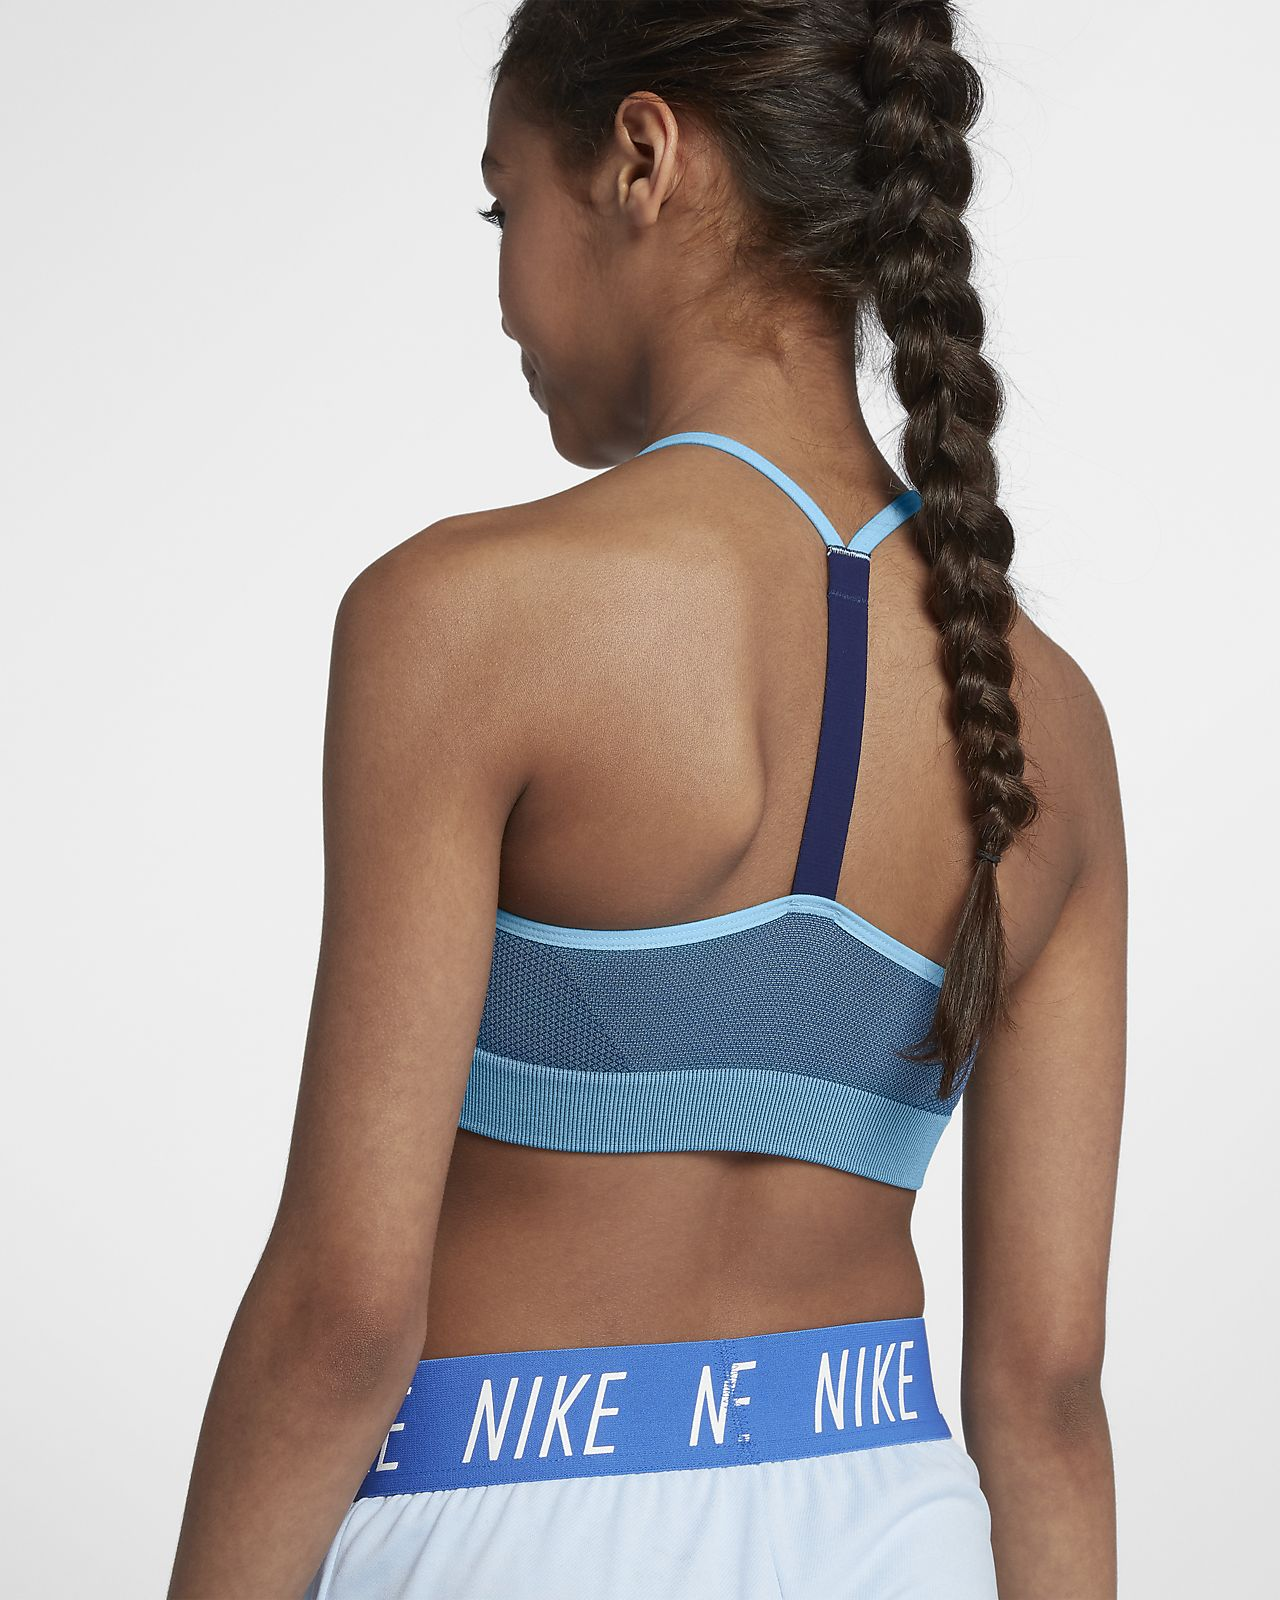 Nike Girls' Sculpt Bra